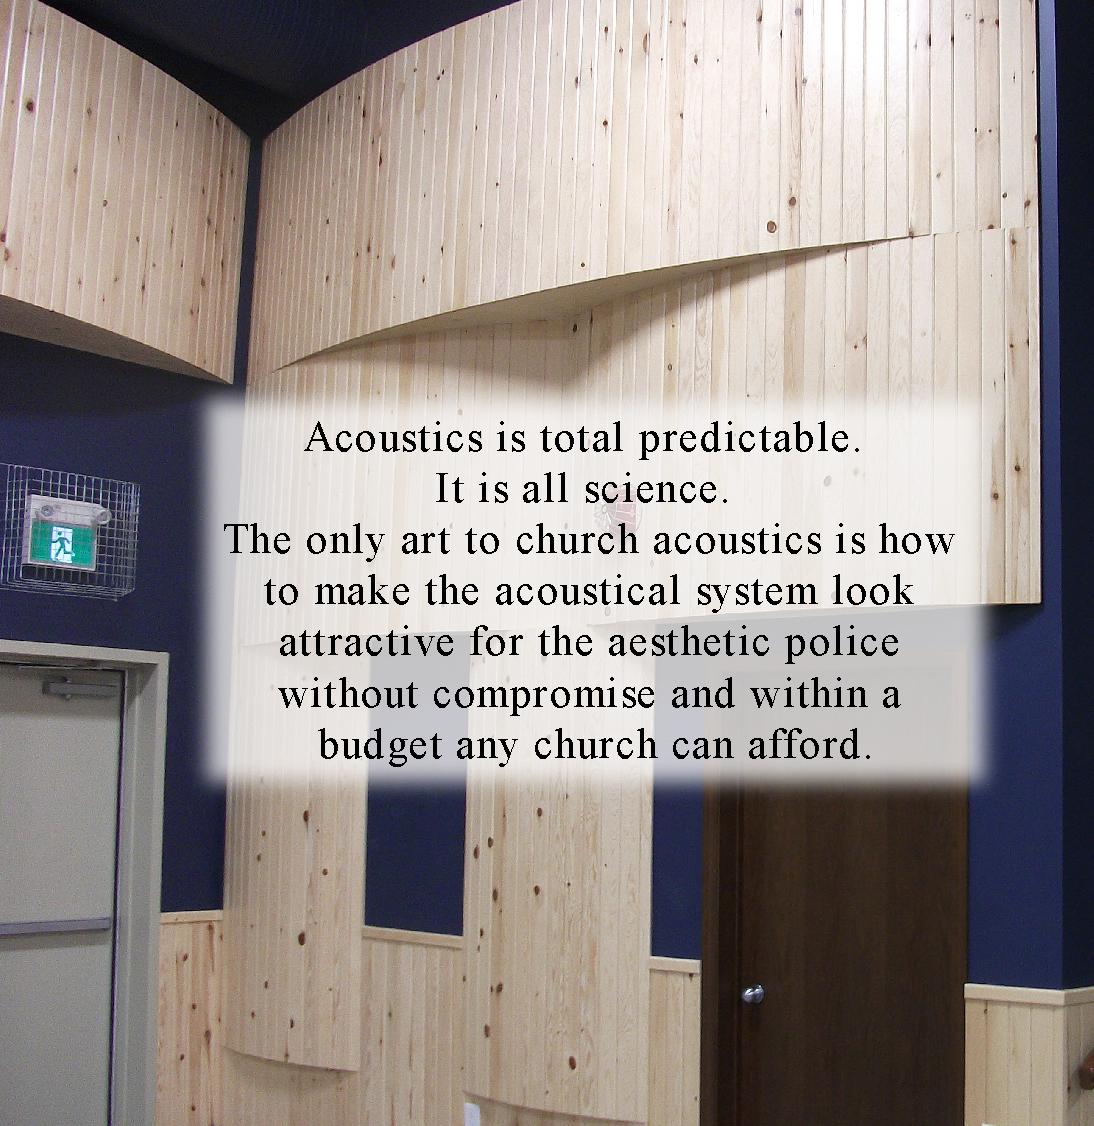 acoustics predicable